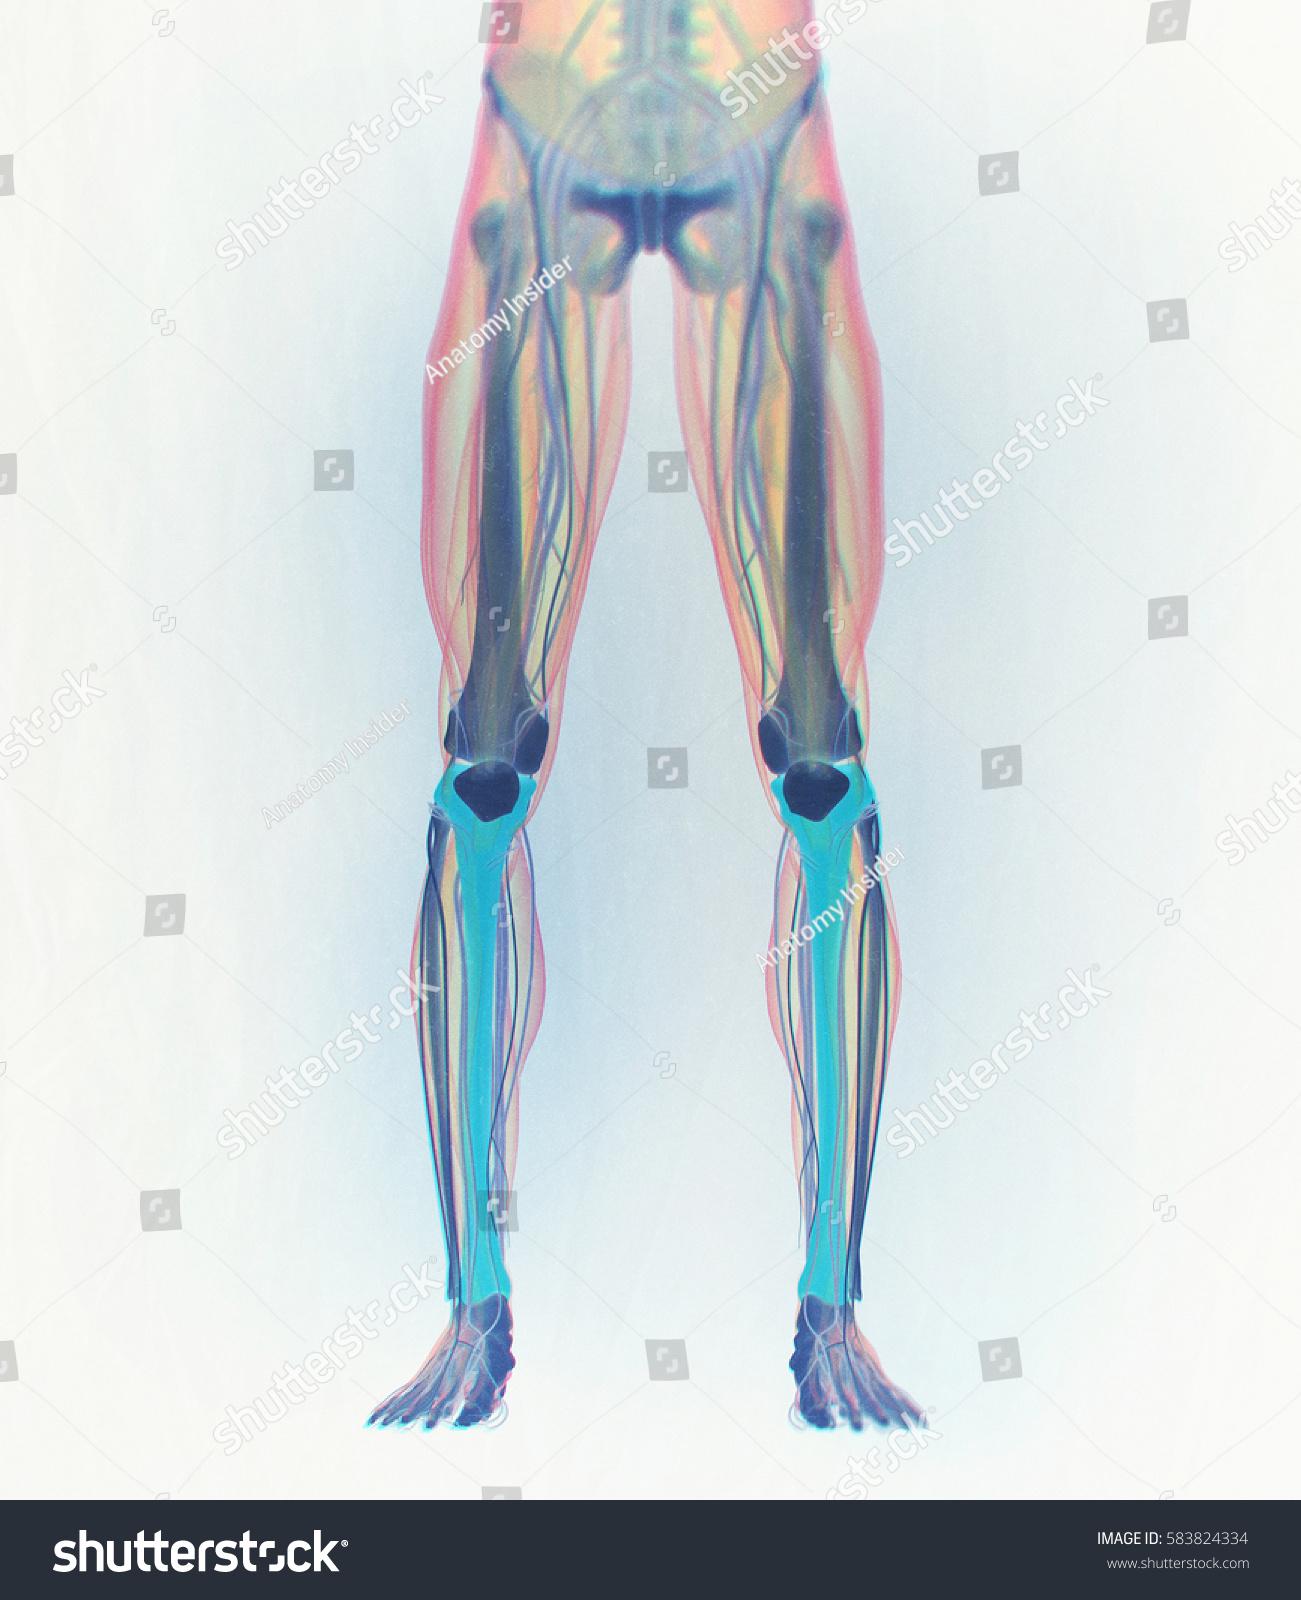 Tibia Bone Human Anatomy 3 D Illustration Stock Illustration ...